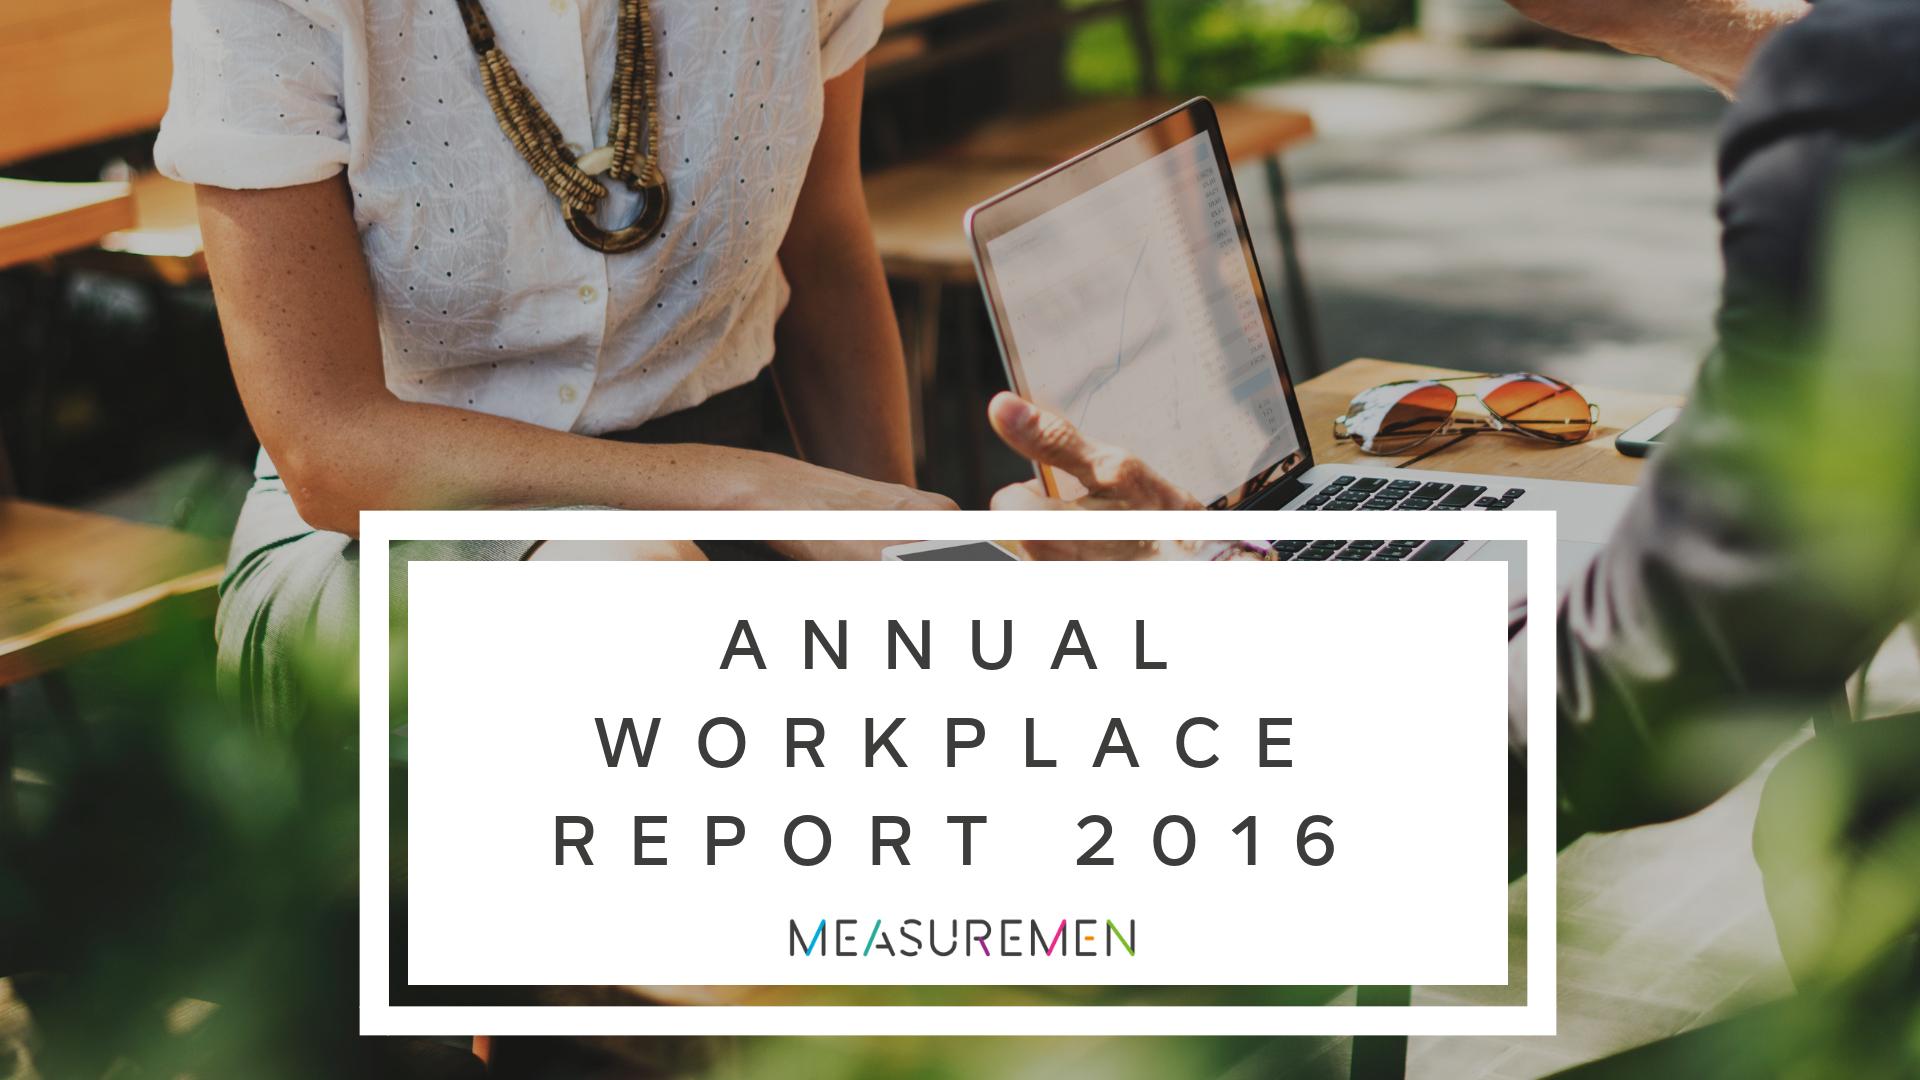 Measuremen Annual Workplace Report 2016